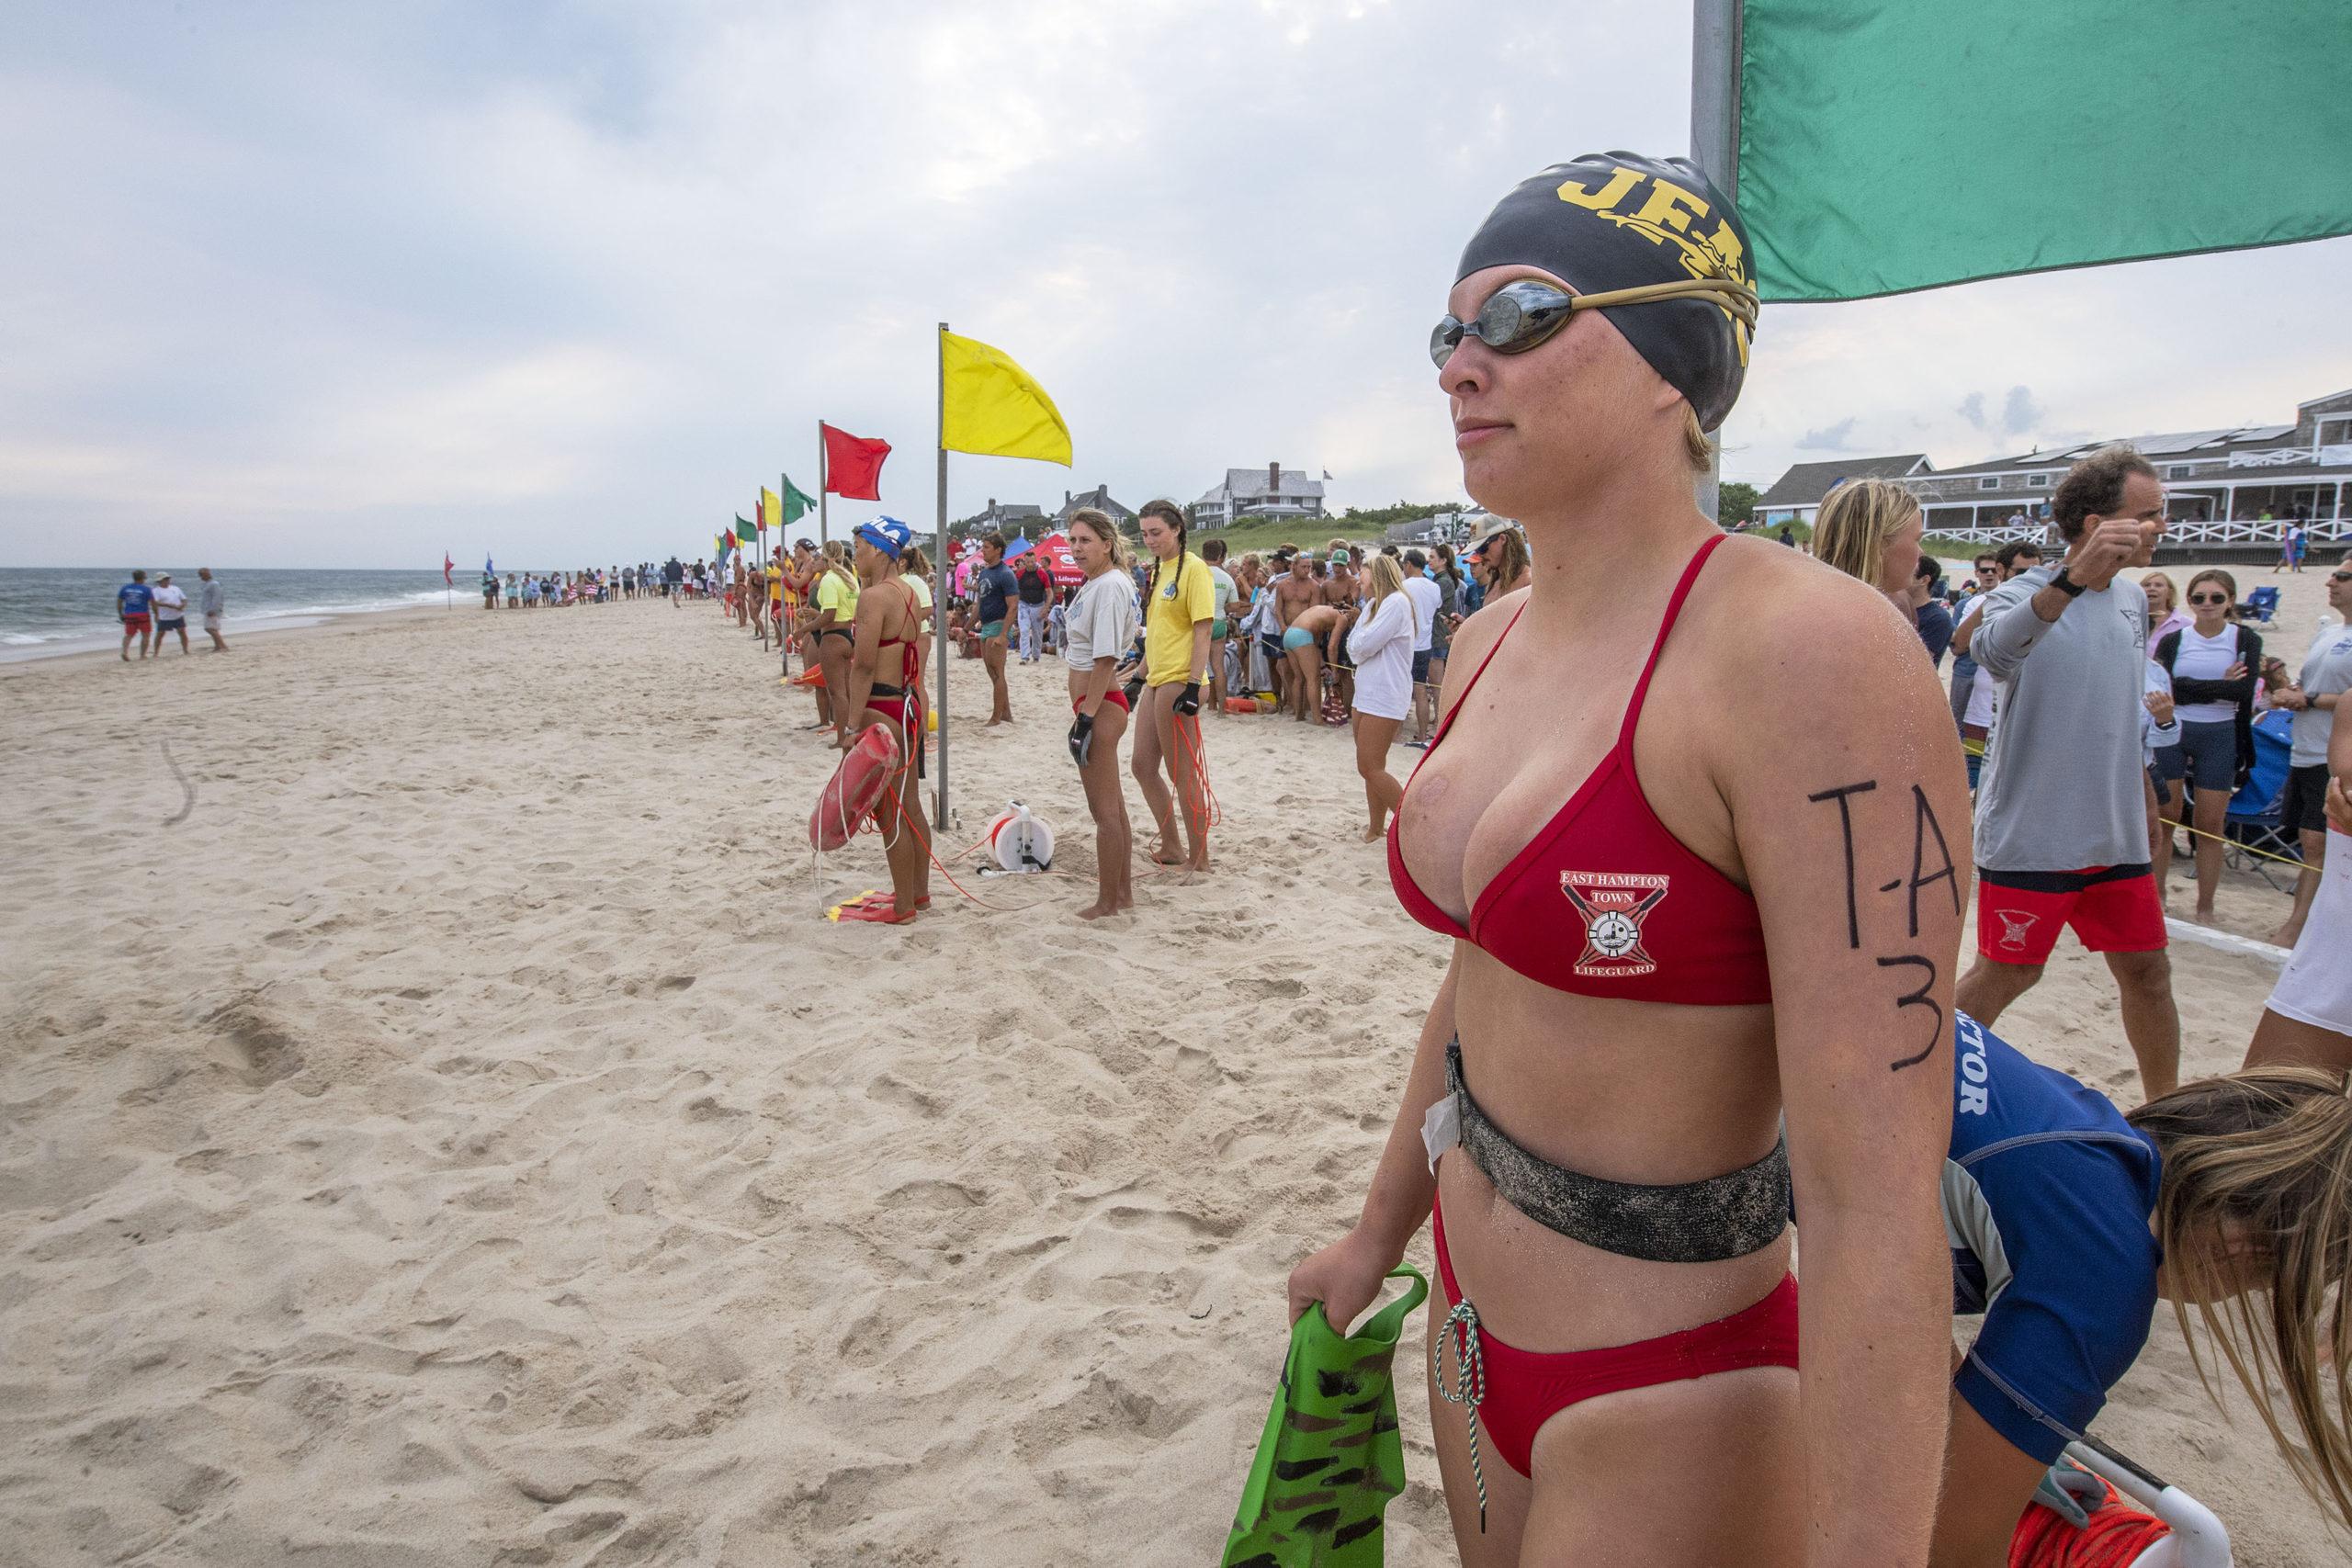 East Hampton Town lifeguard Frances Michaels readies herself for the women's landline rescue.